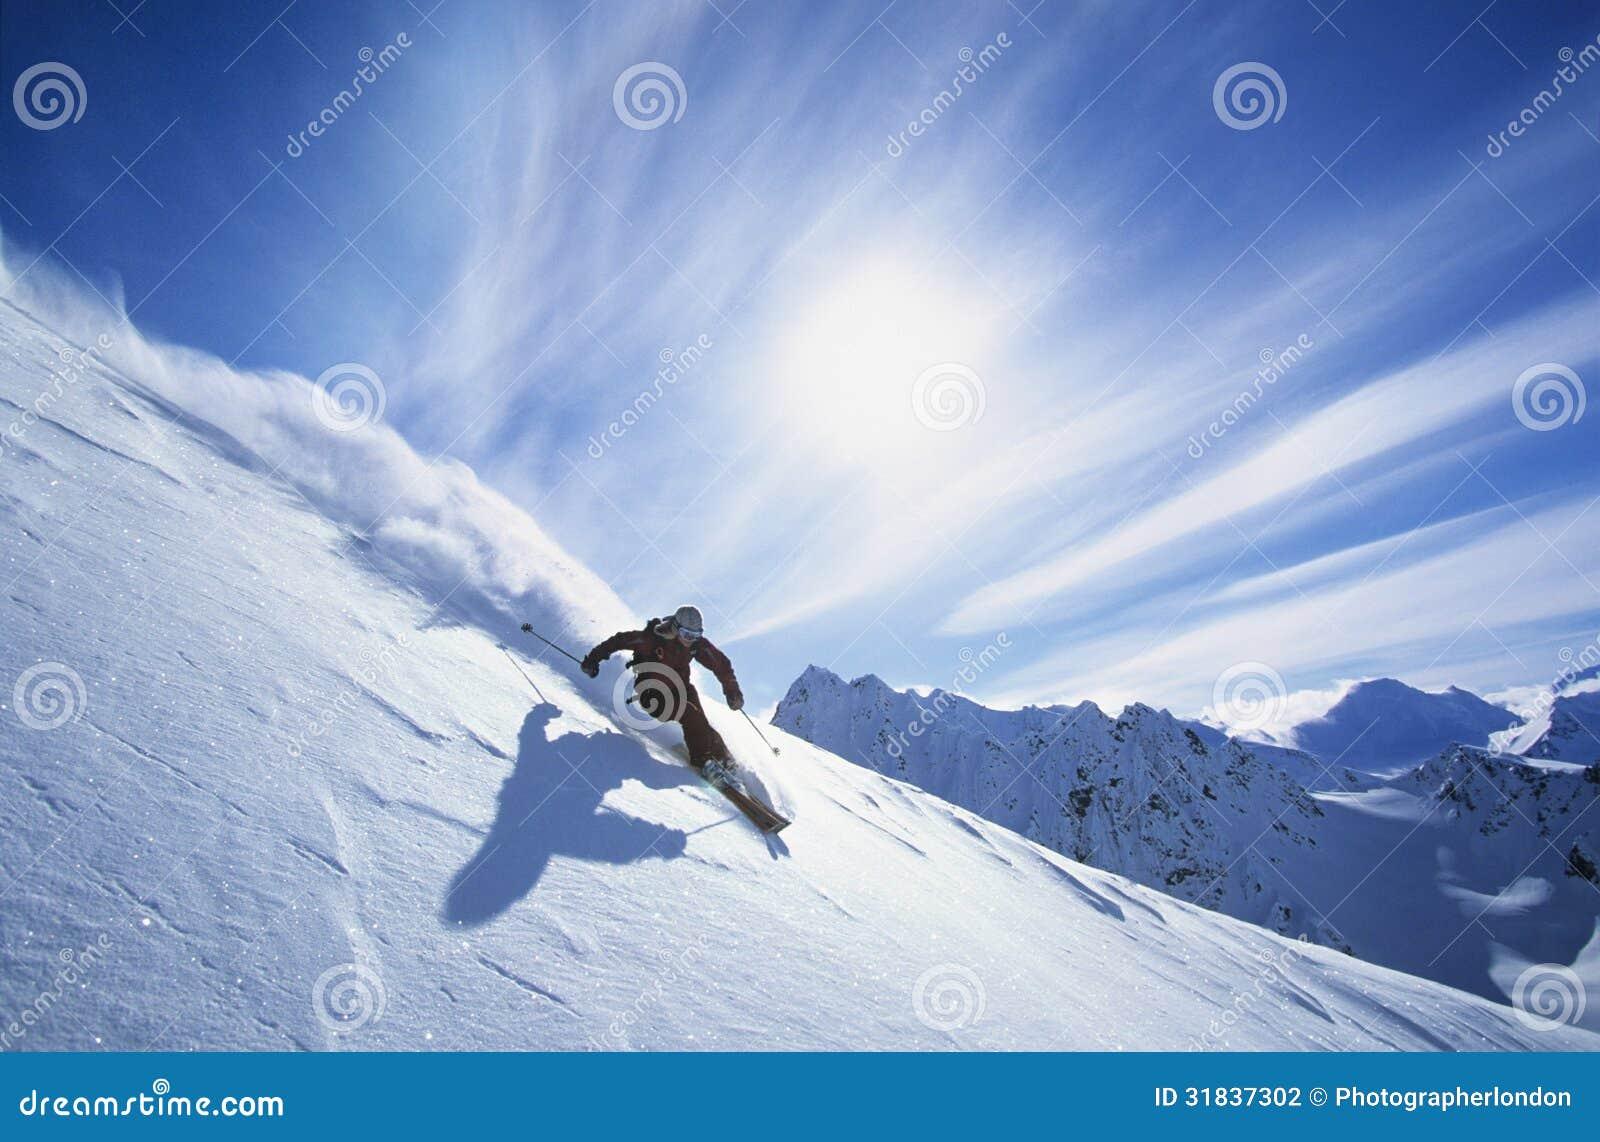 Skier Skiing On Mountain Slope Stock Photo - Image Of Energy, Adult 31837302-4386